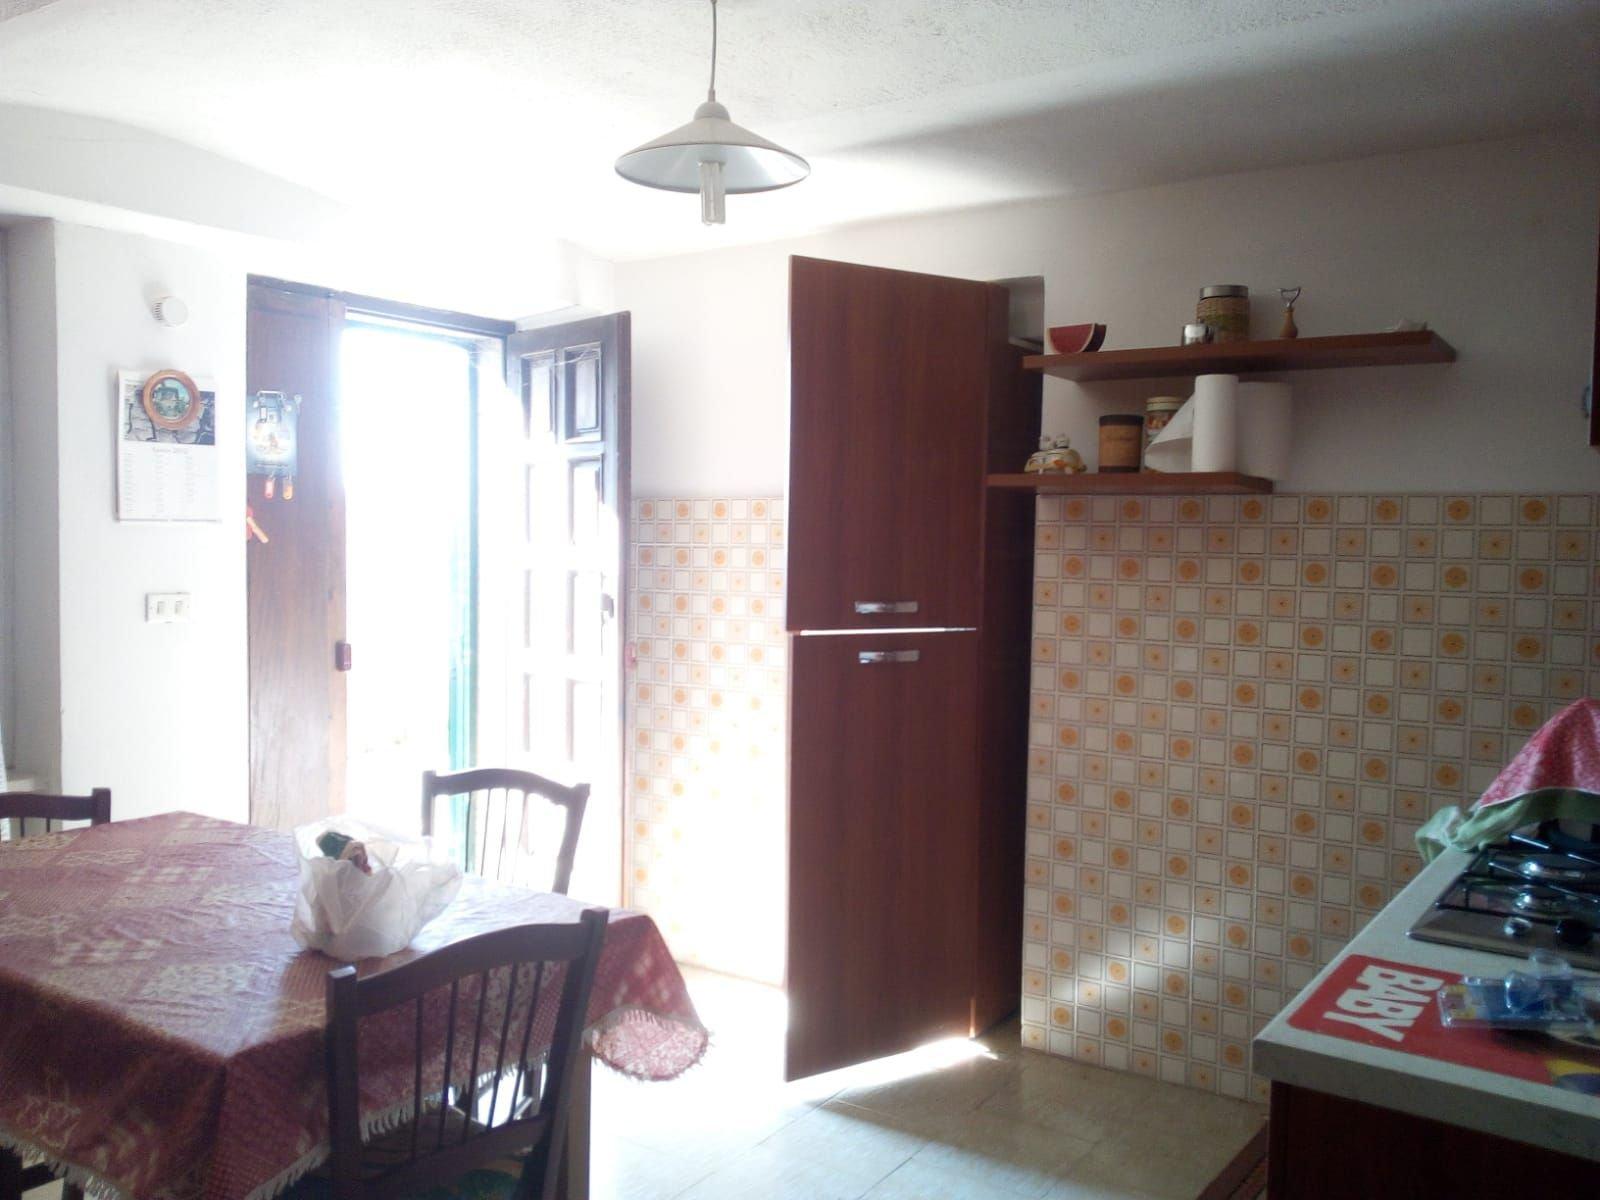 Casa in cassinasco